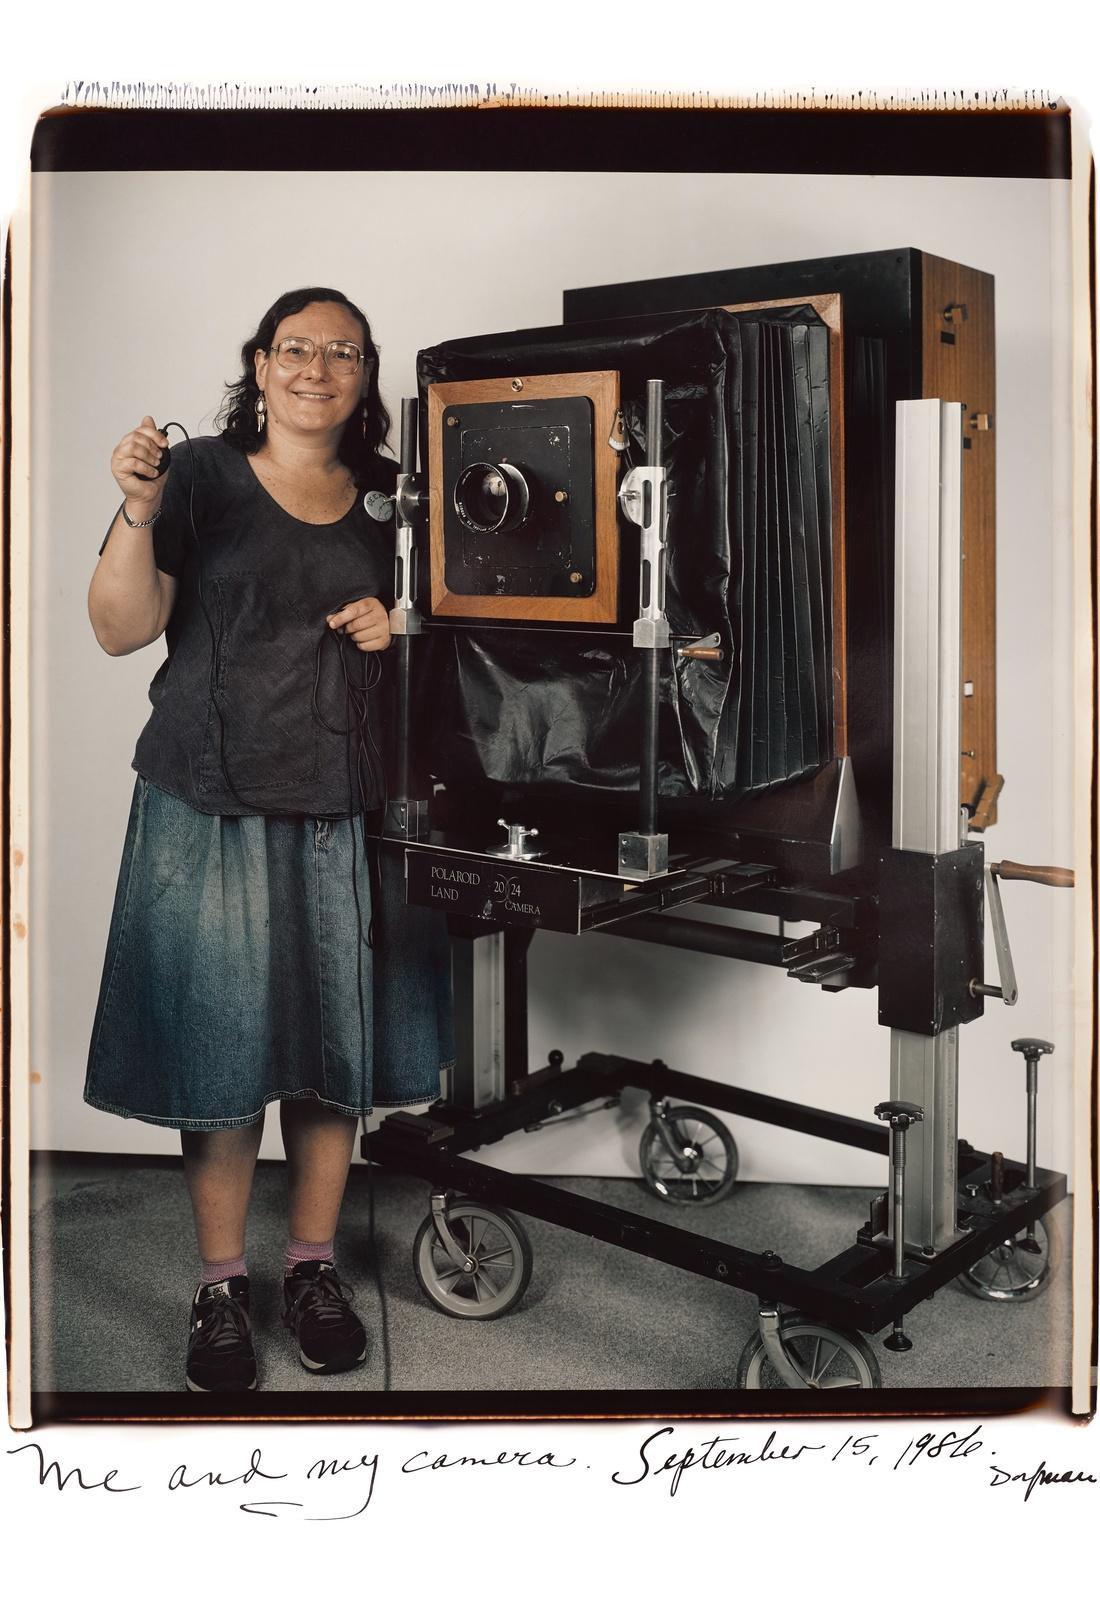 Elsa Dorfman, Me and my camera, 1986. Courtesy of the artist.